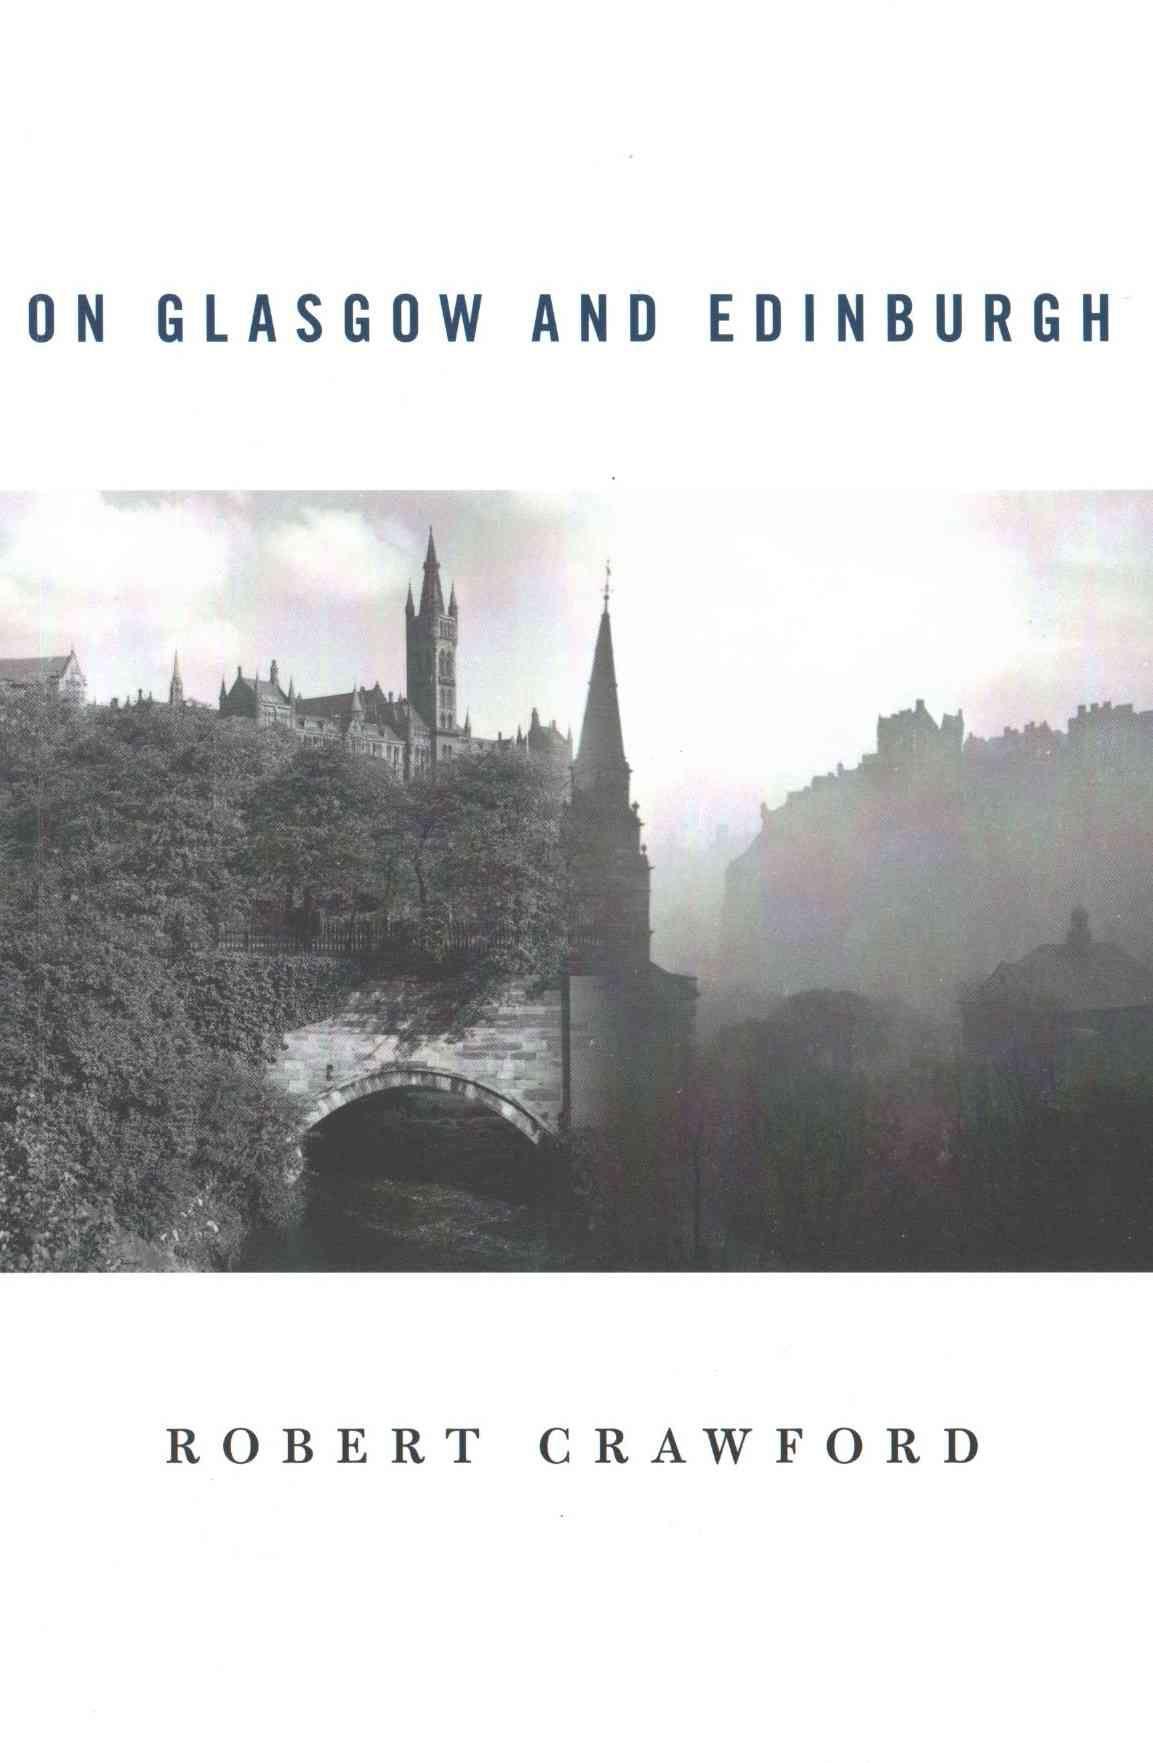 On Glasgow and Edinburgh